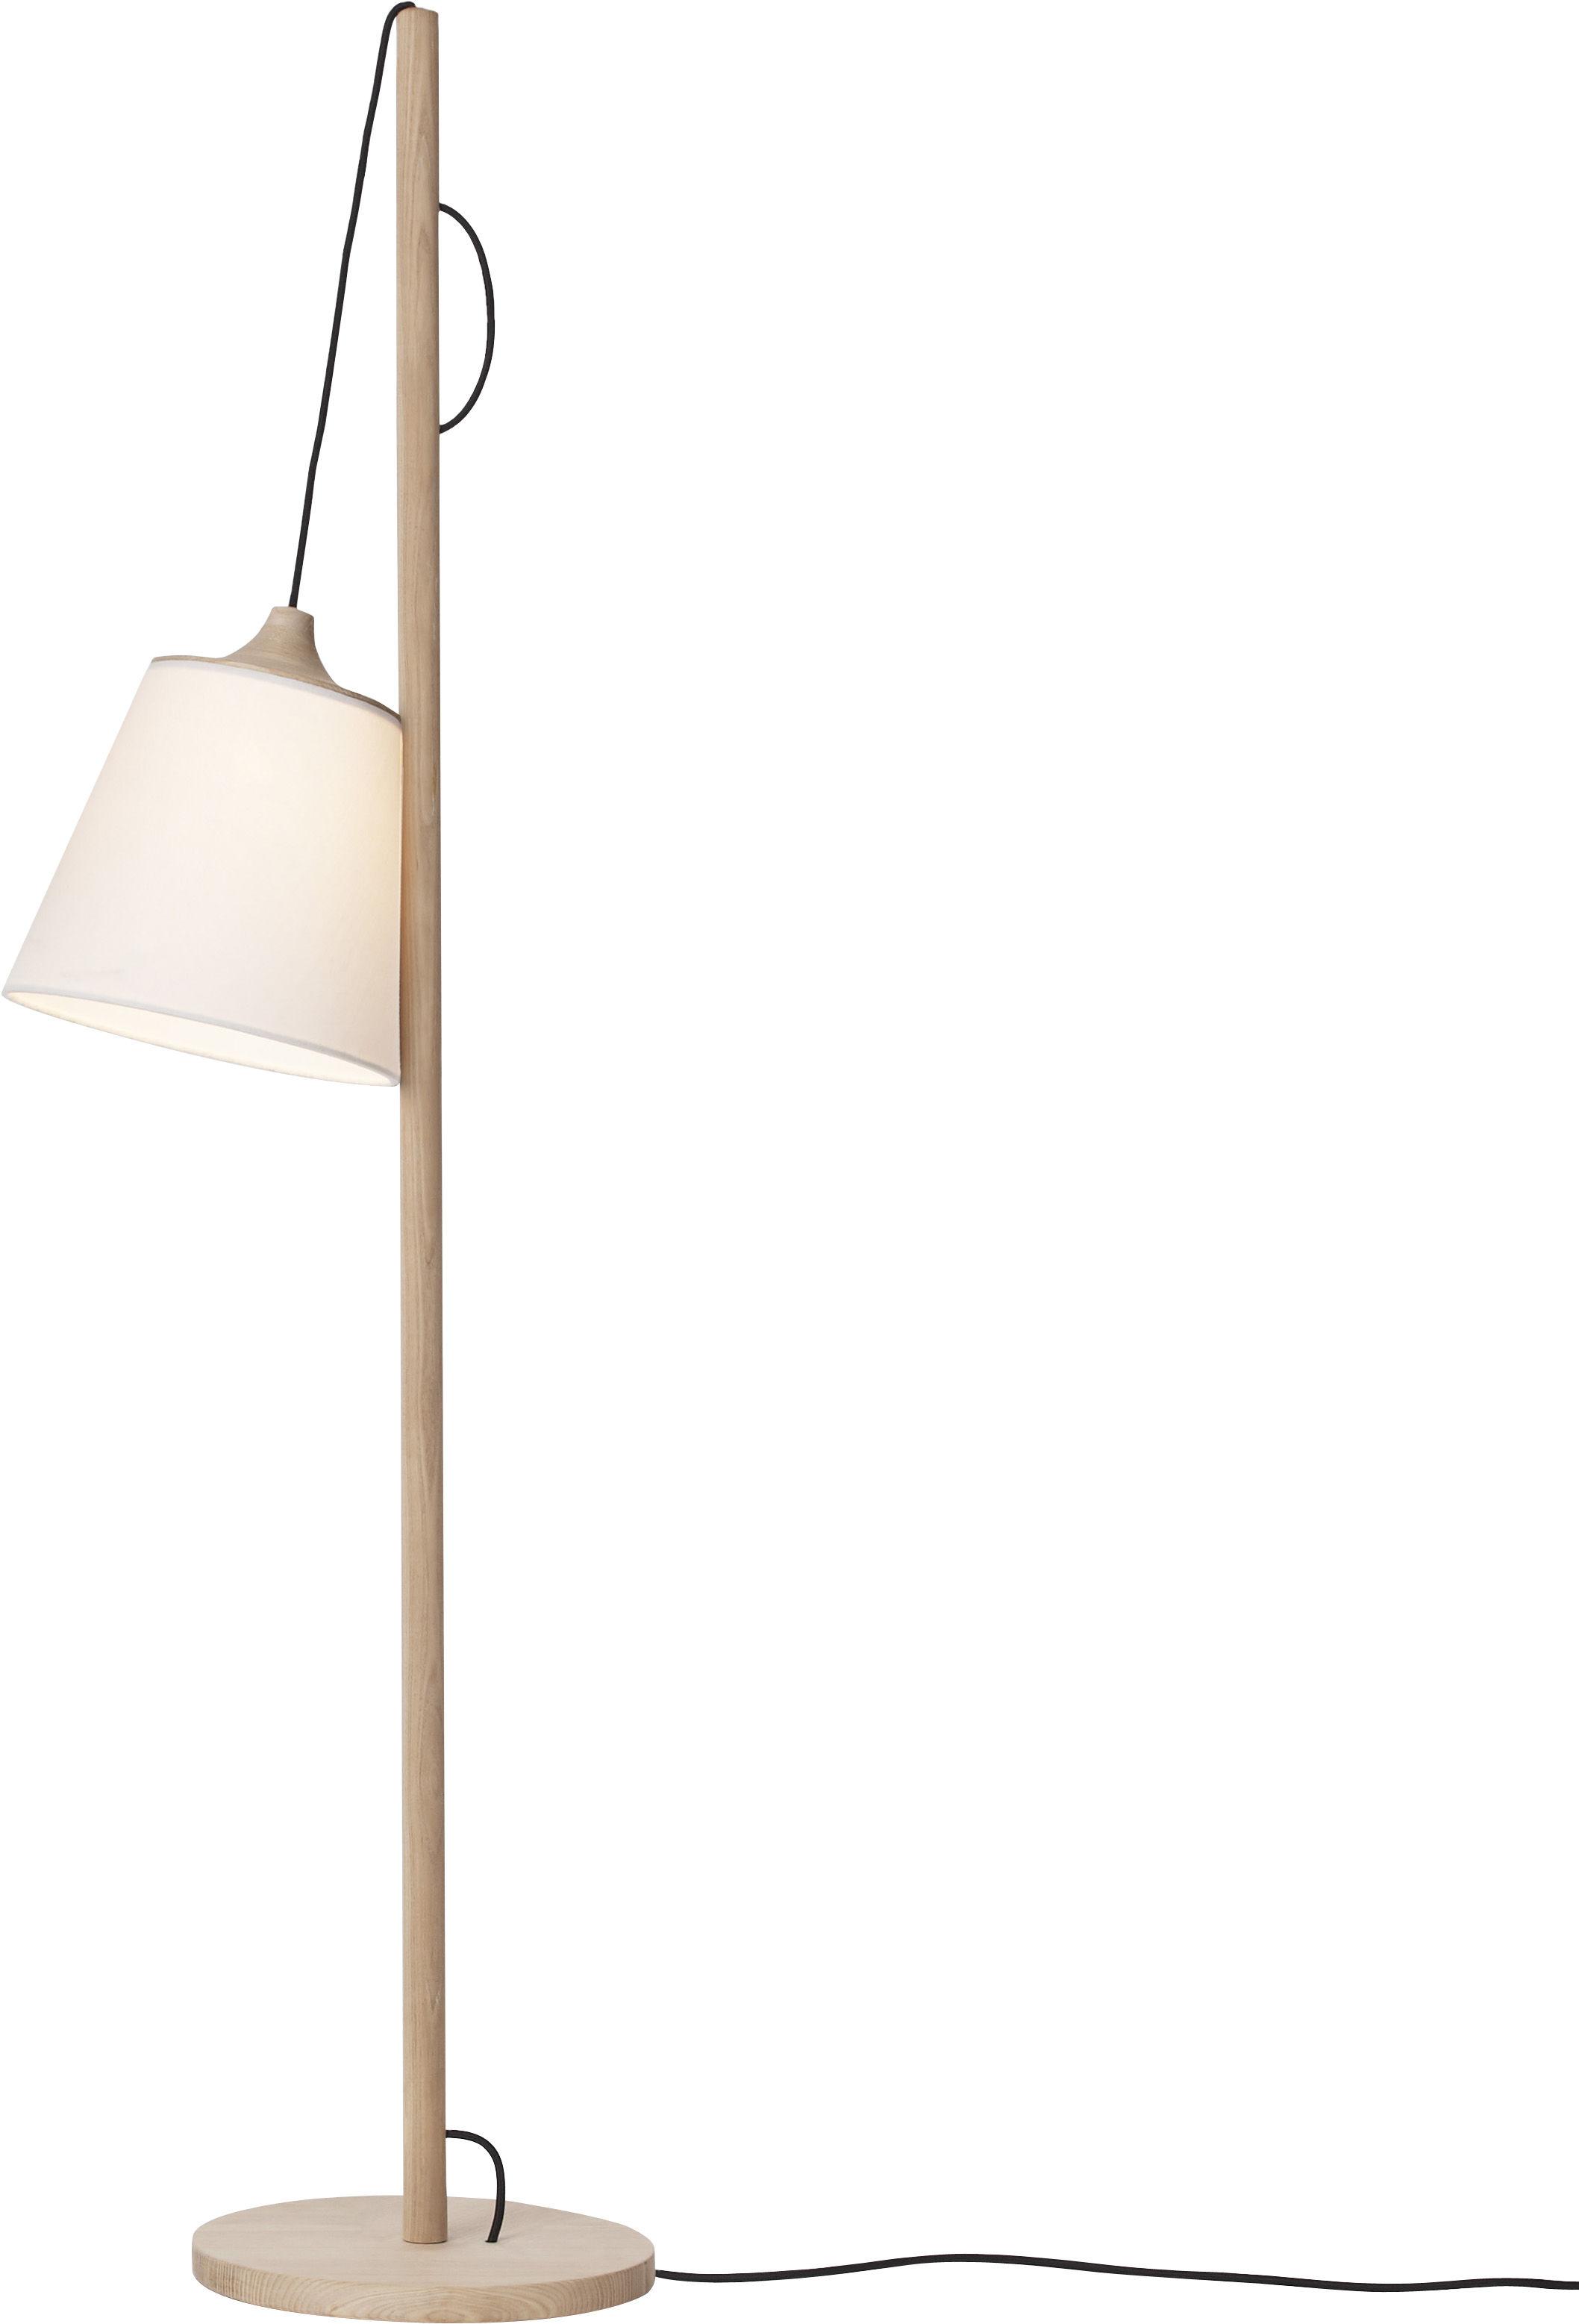 Ungdommelig Floor lamp Pull lamp by Muuto - Light wood / white lampshade - h 24 OO-28